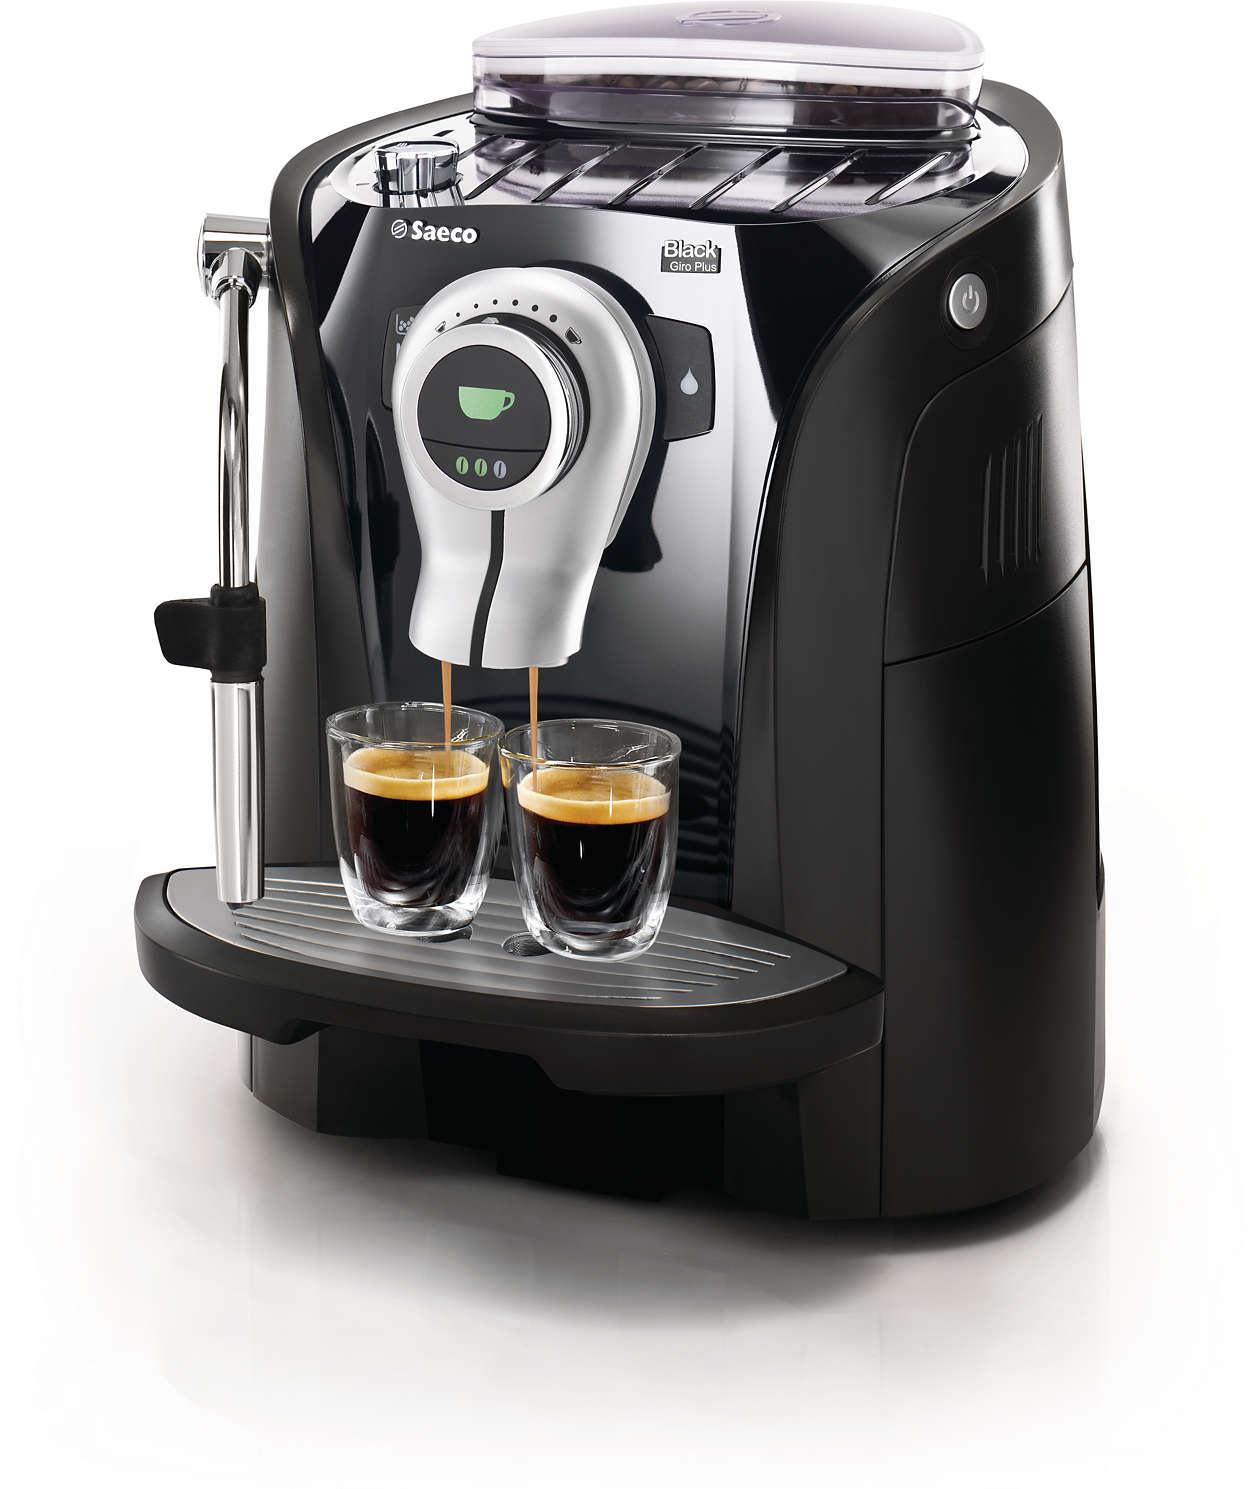 odea automatisk espressomaskin ri9755 11 saeco. Black Bedroom Furniture Sets. Home Design Ideas